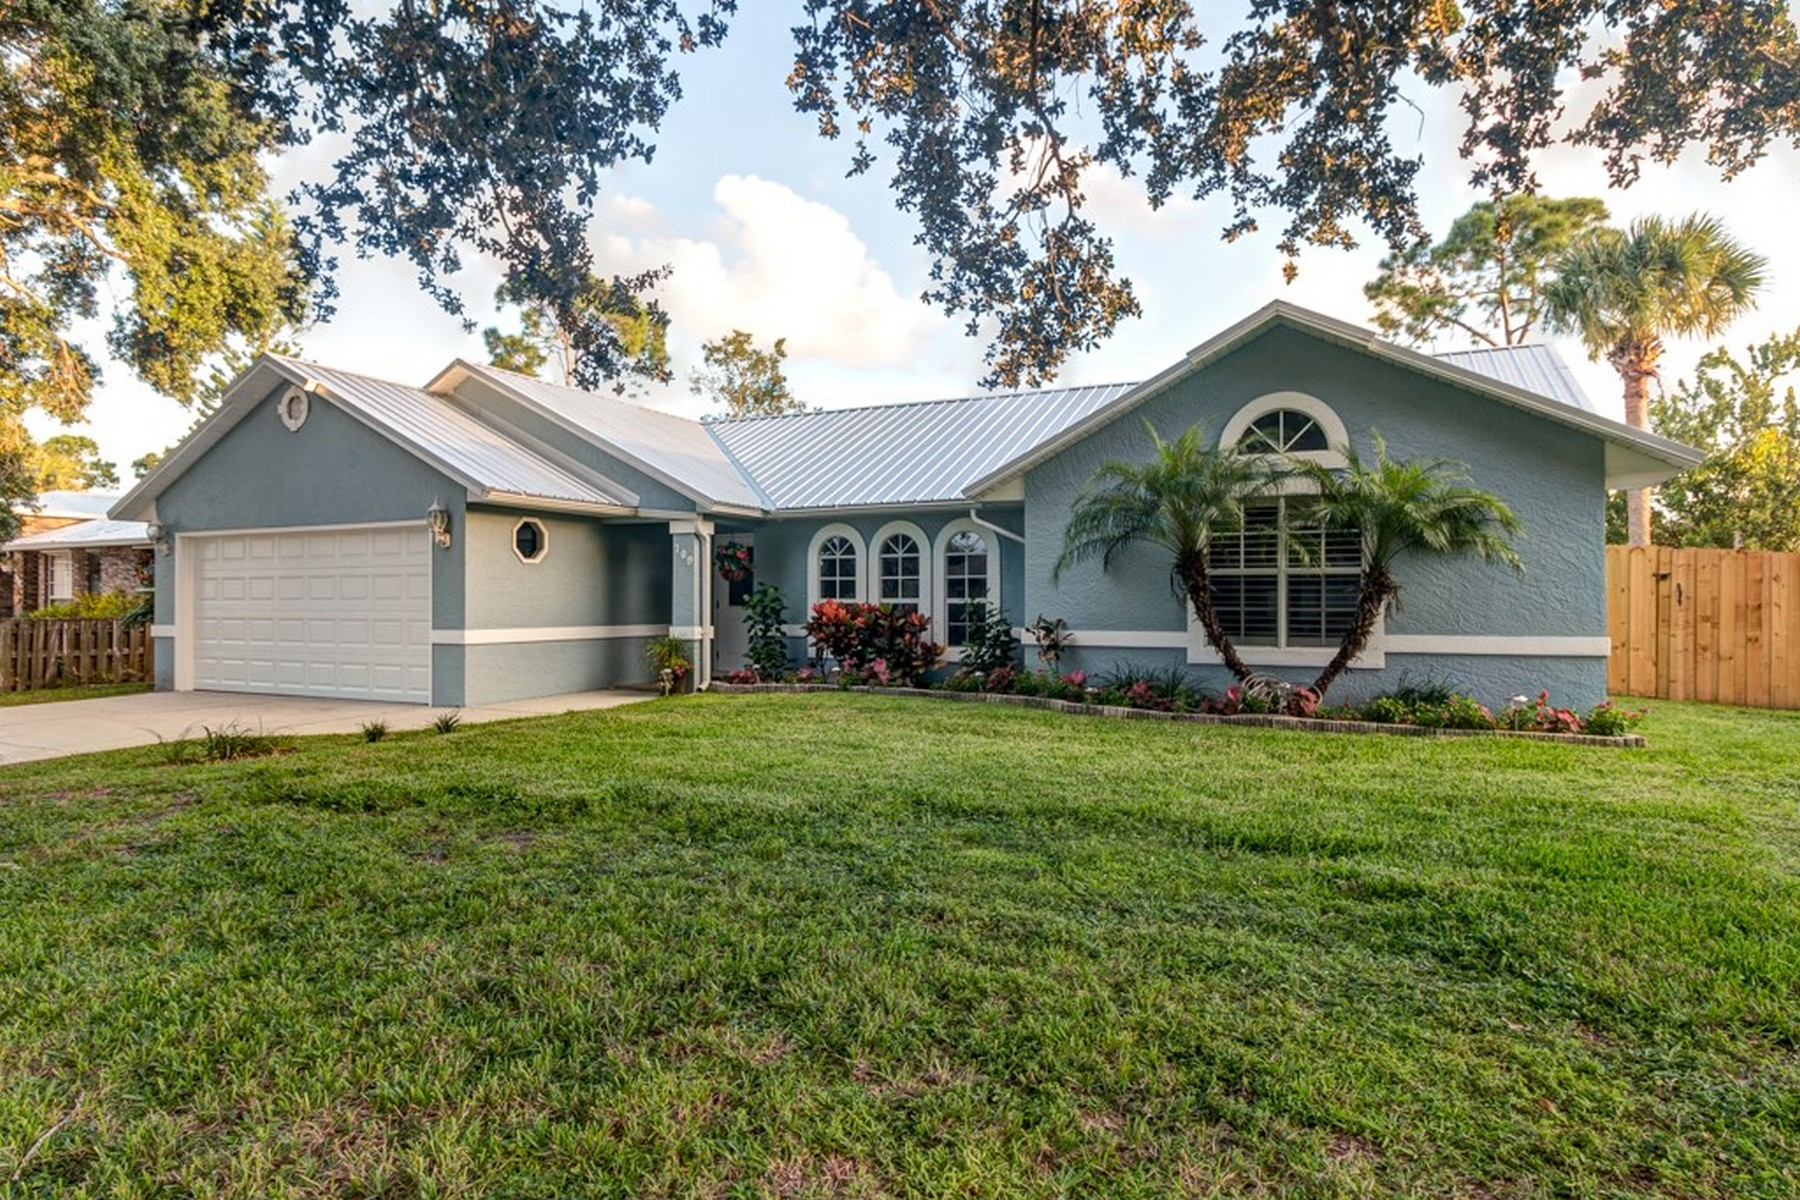 Lovely Home with New Metal Roof 709 Doctor Avenue Sebastian, Florida 32958 Hoa Kỳ